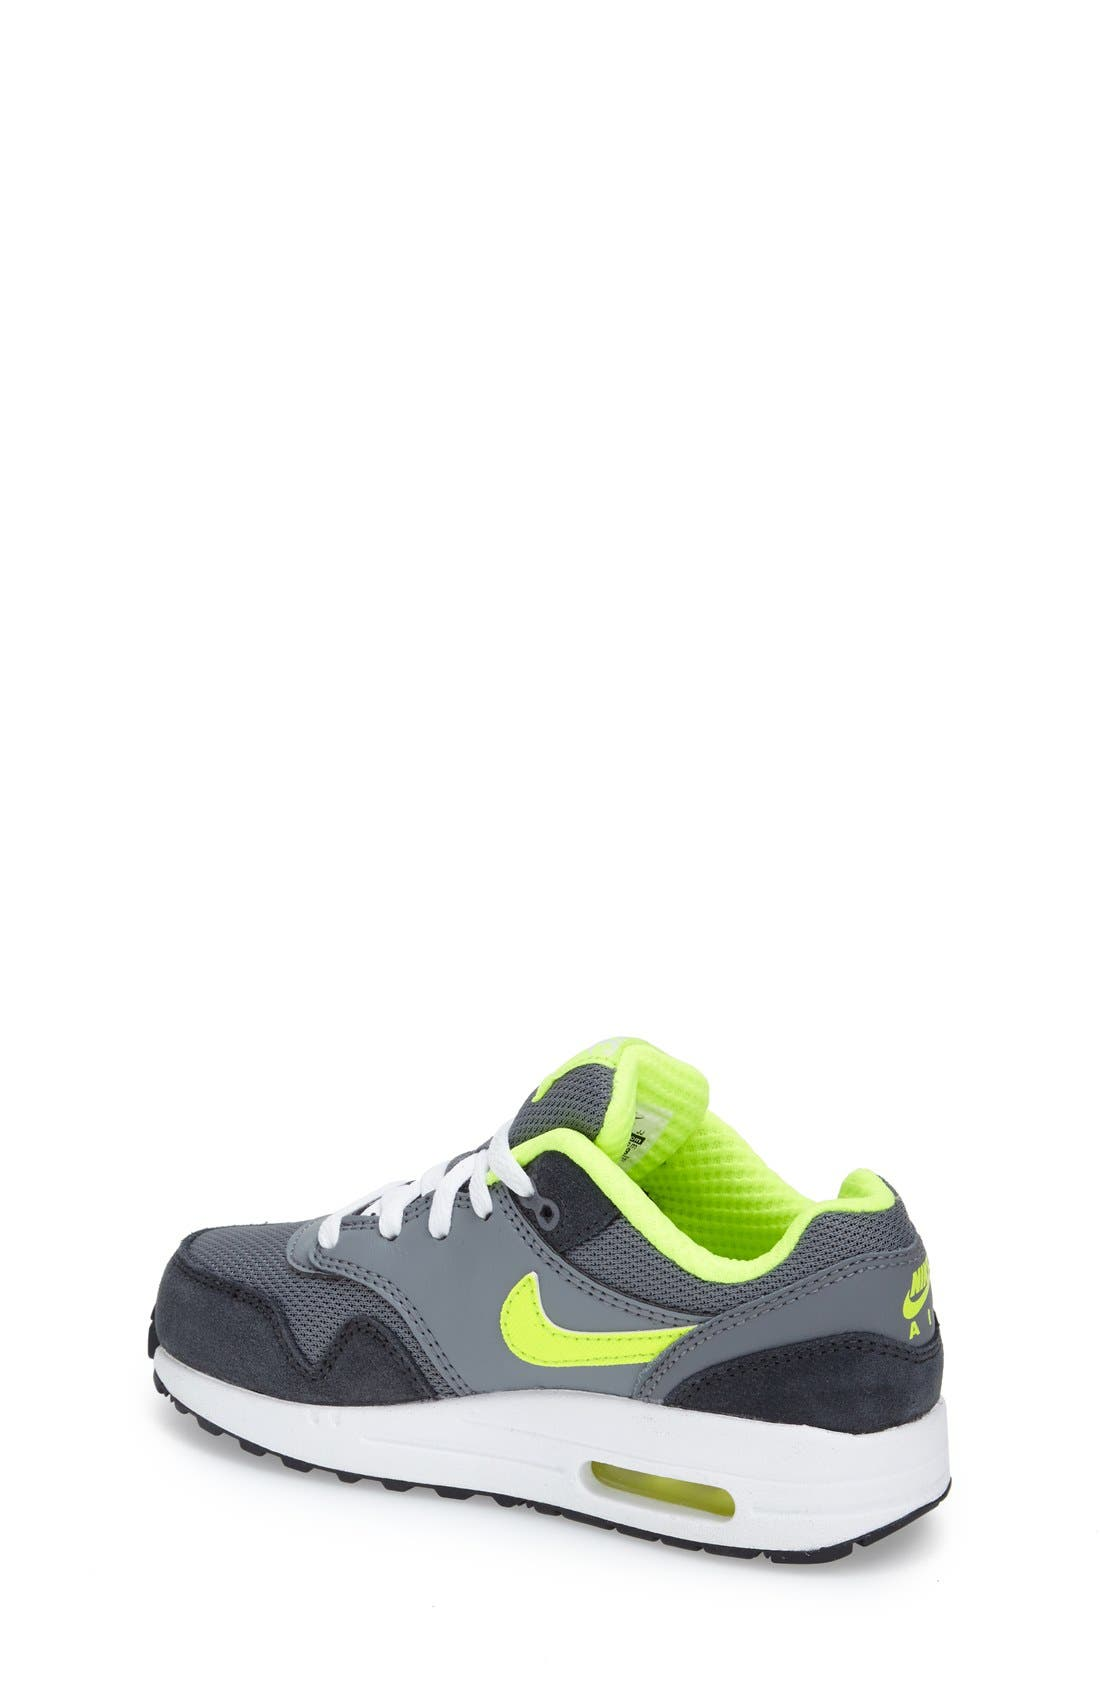 Alternate Image 2  - Nike 'Air Max 1 PS' Sneaker (Toddler & Little Kid)